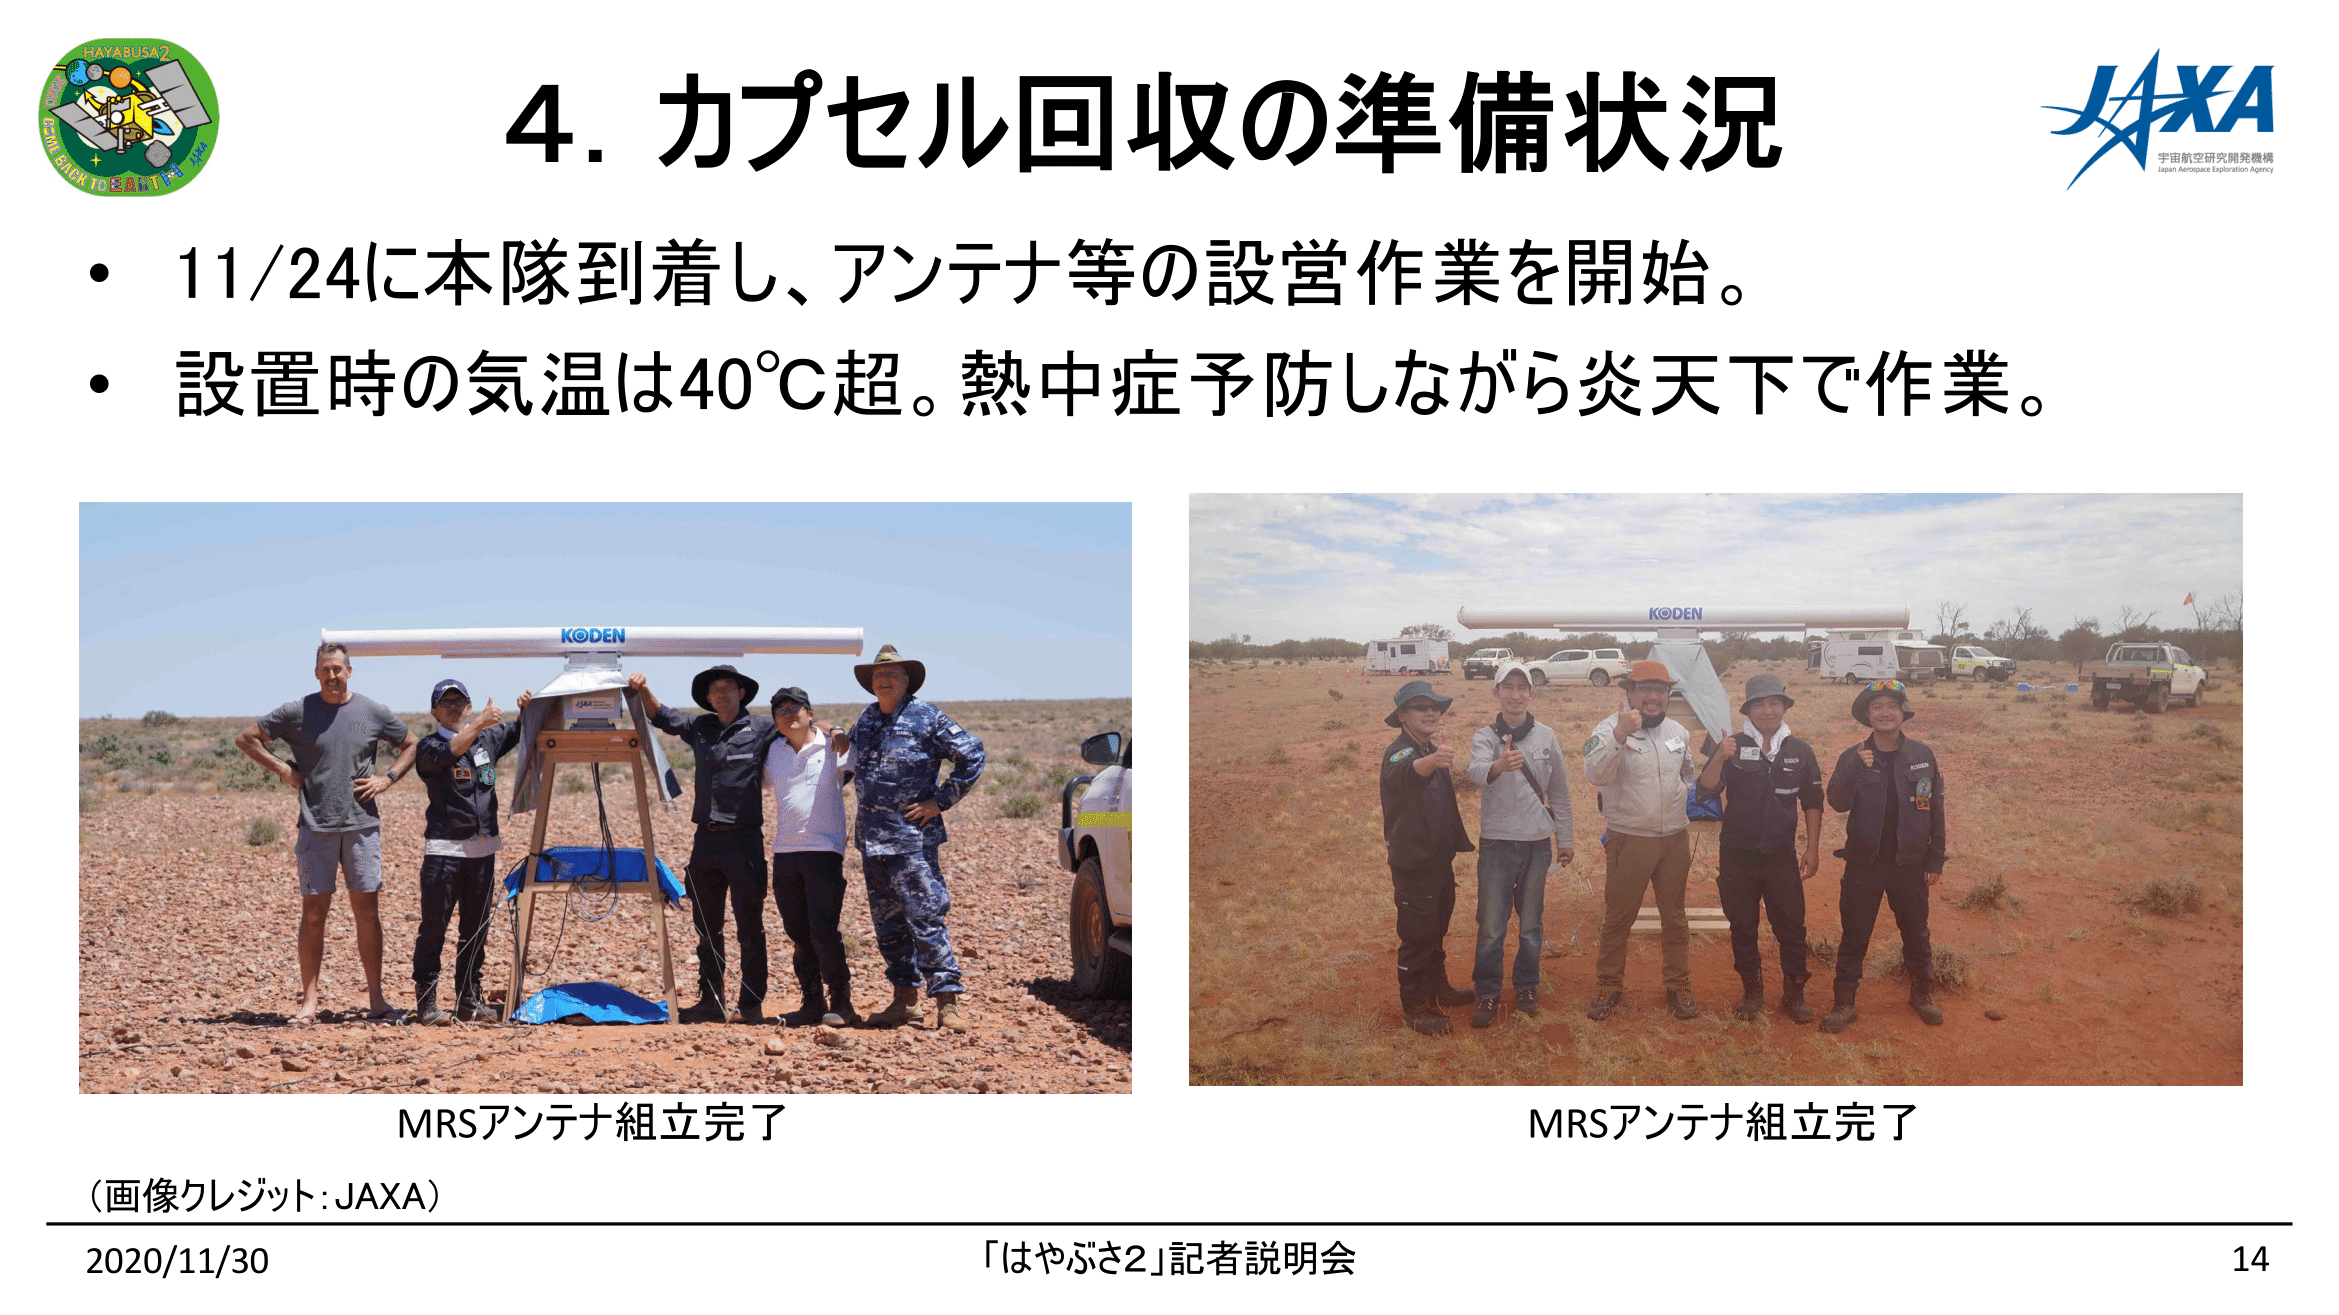 f:id:Imamura:20201130154142p:plain